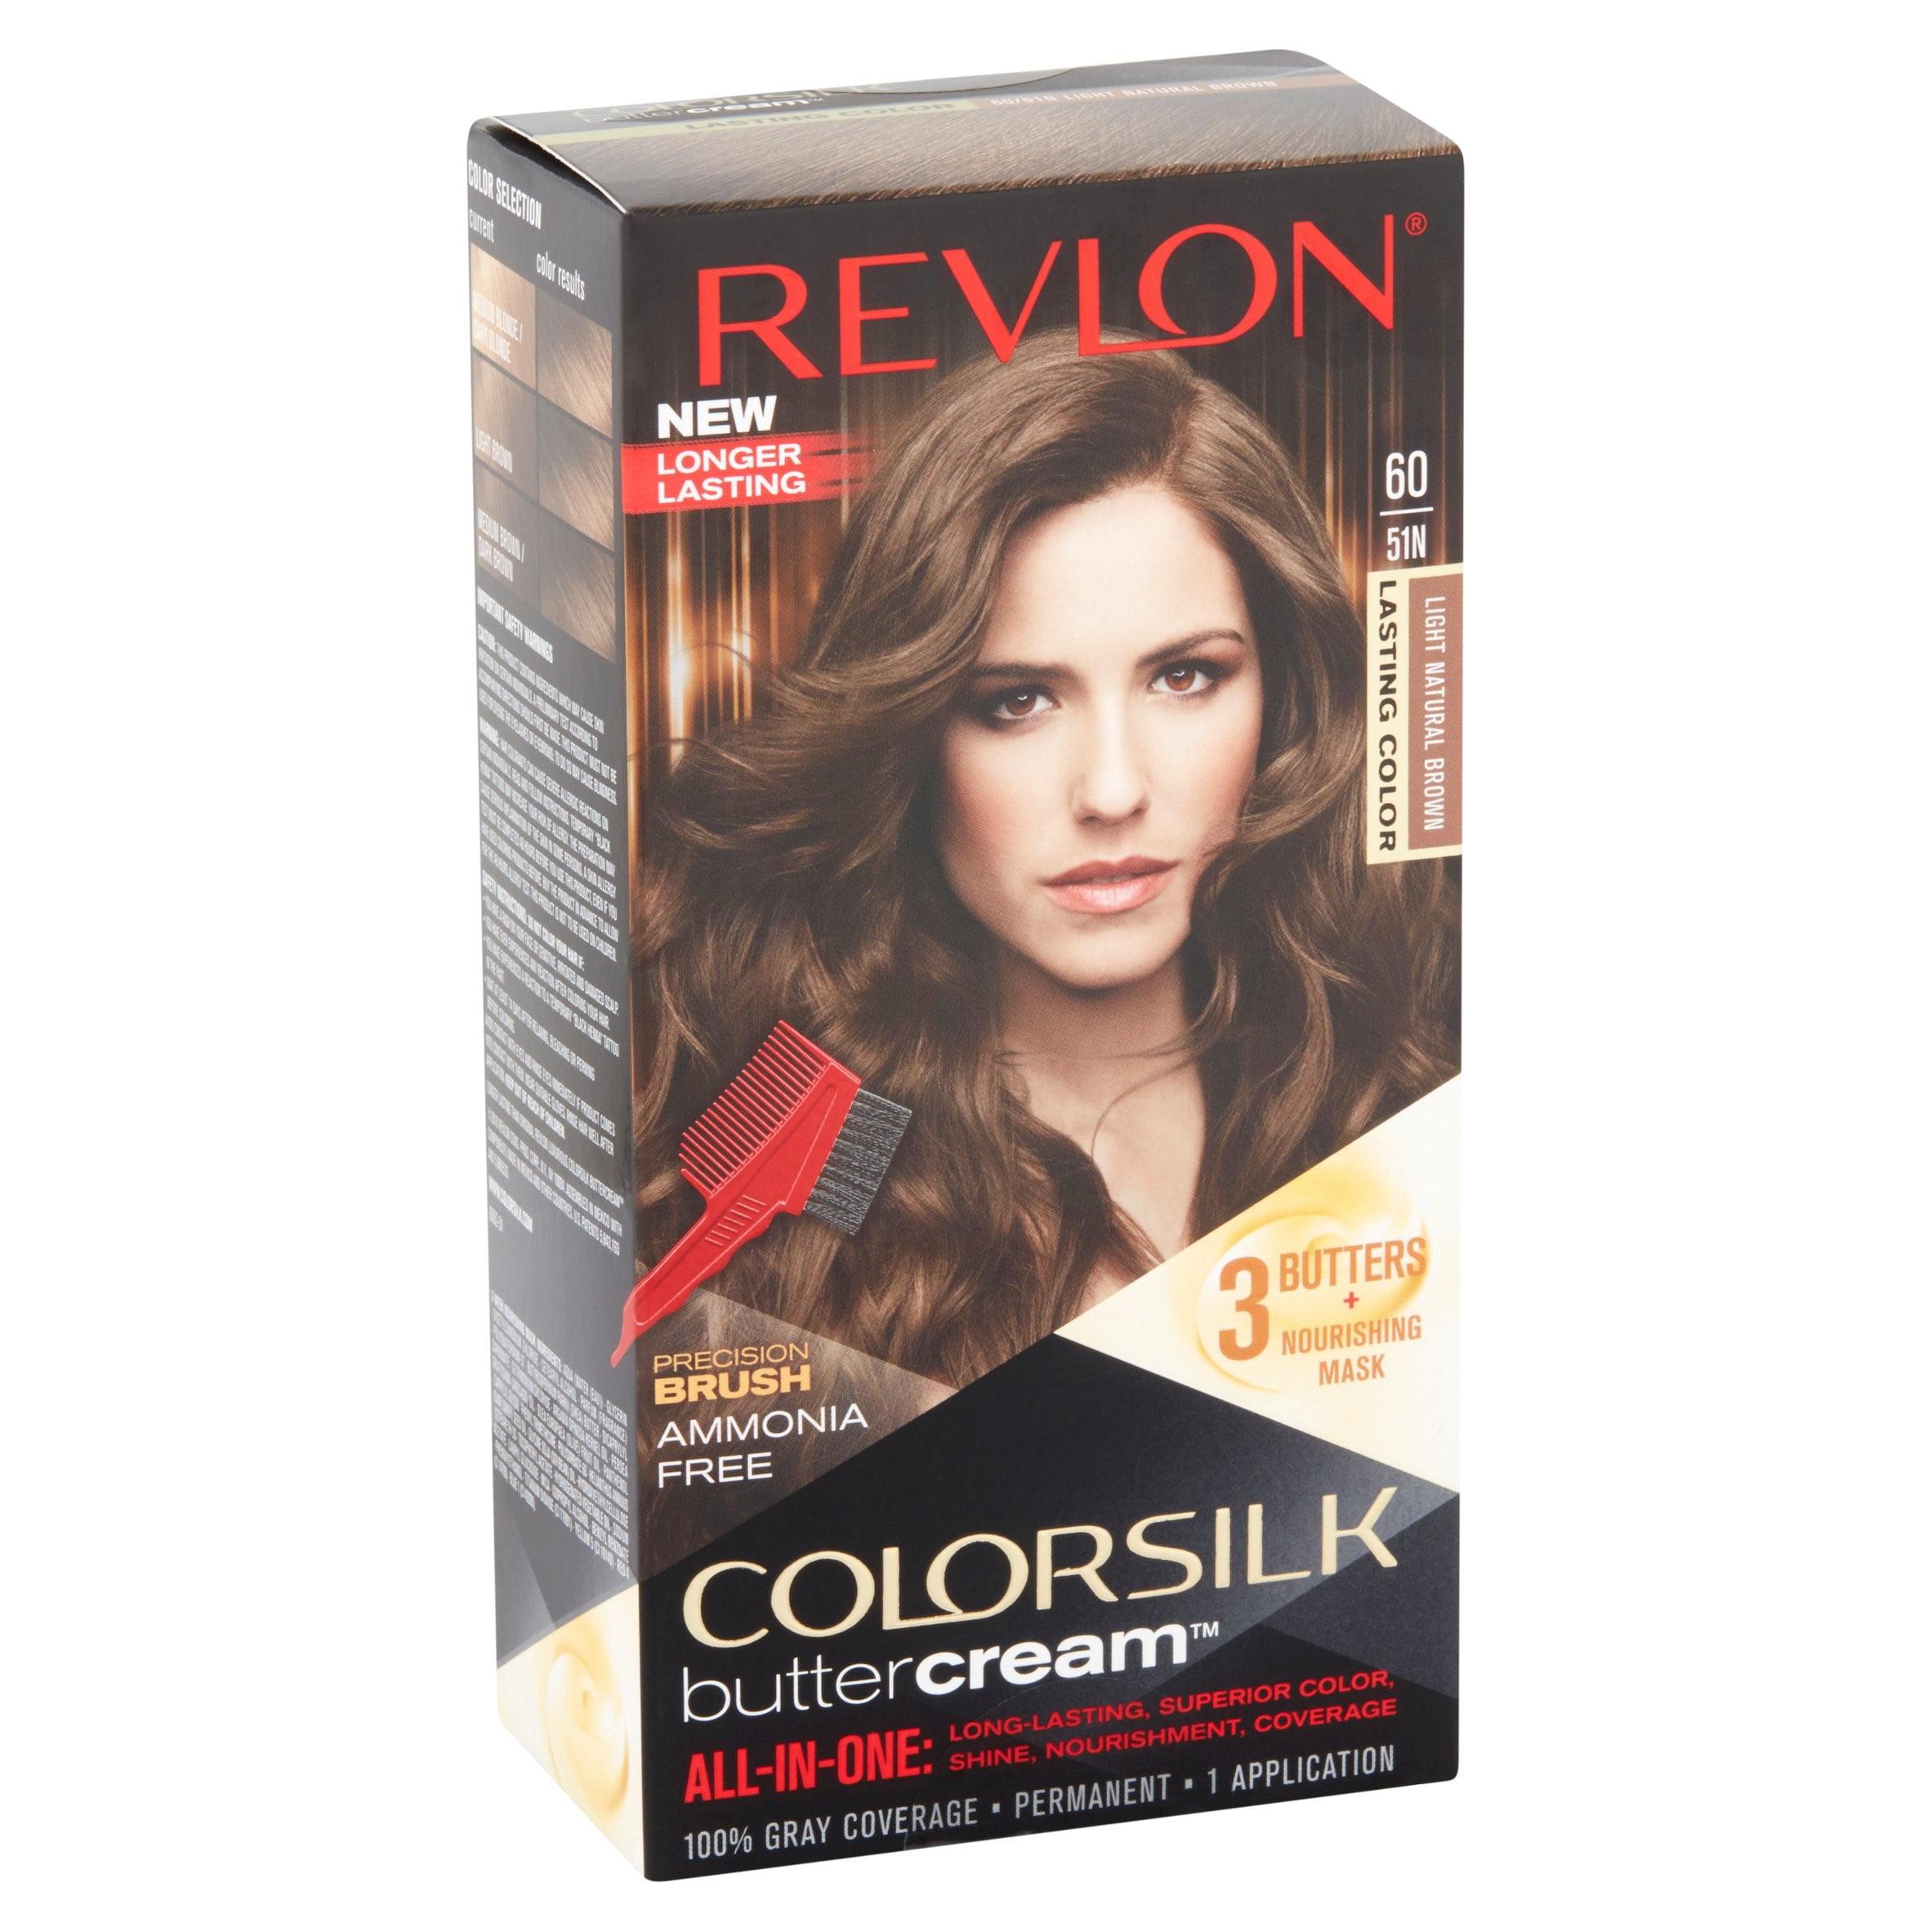 Revlon colorsilk buttercream hair color, 53 medium golden brown - Walmart.com